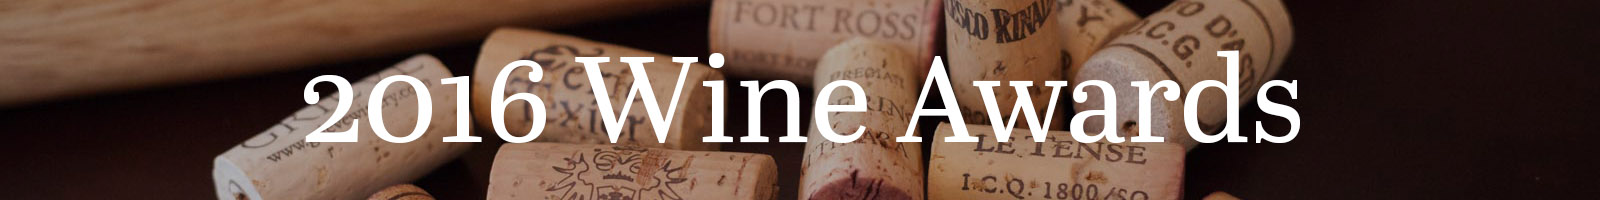 2016 Wine Awards, Opening a Bottle